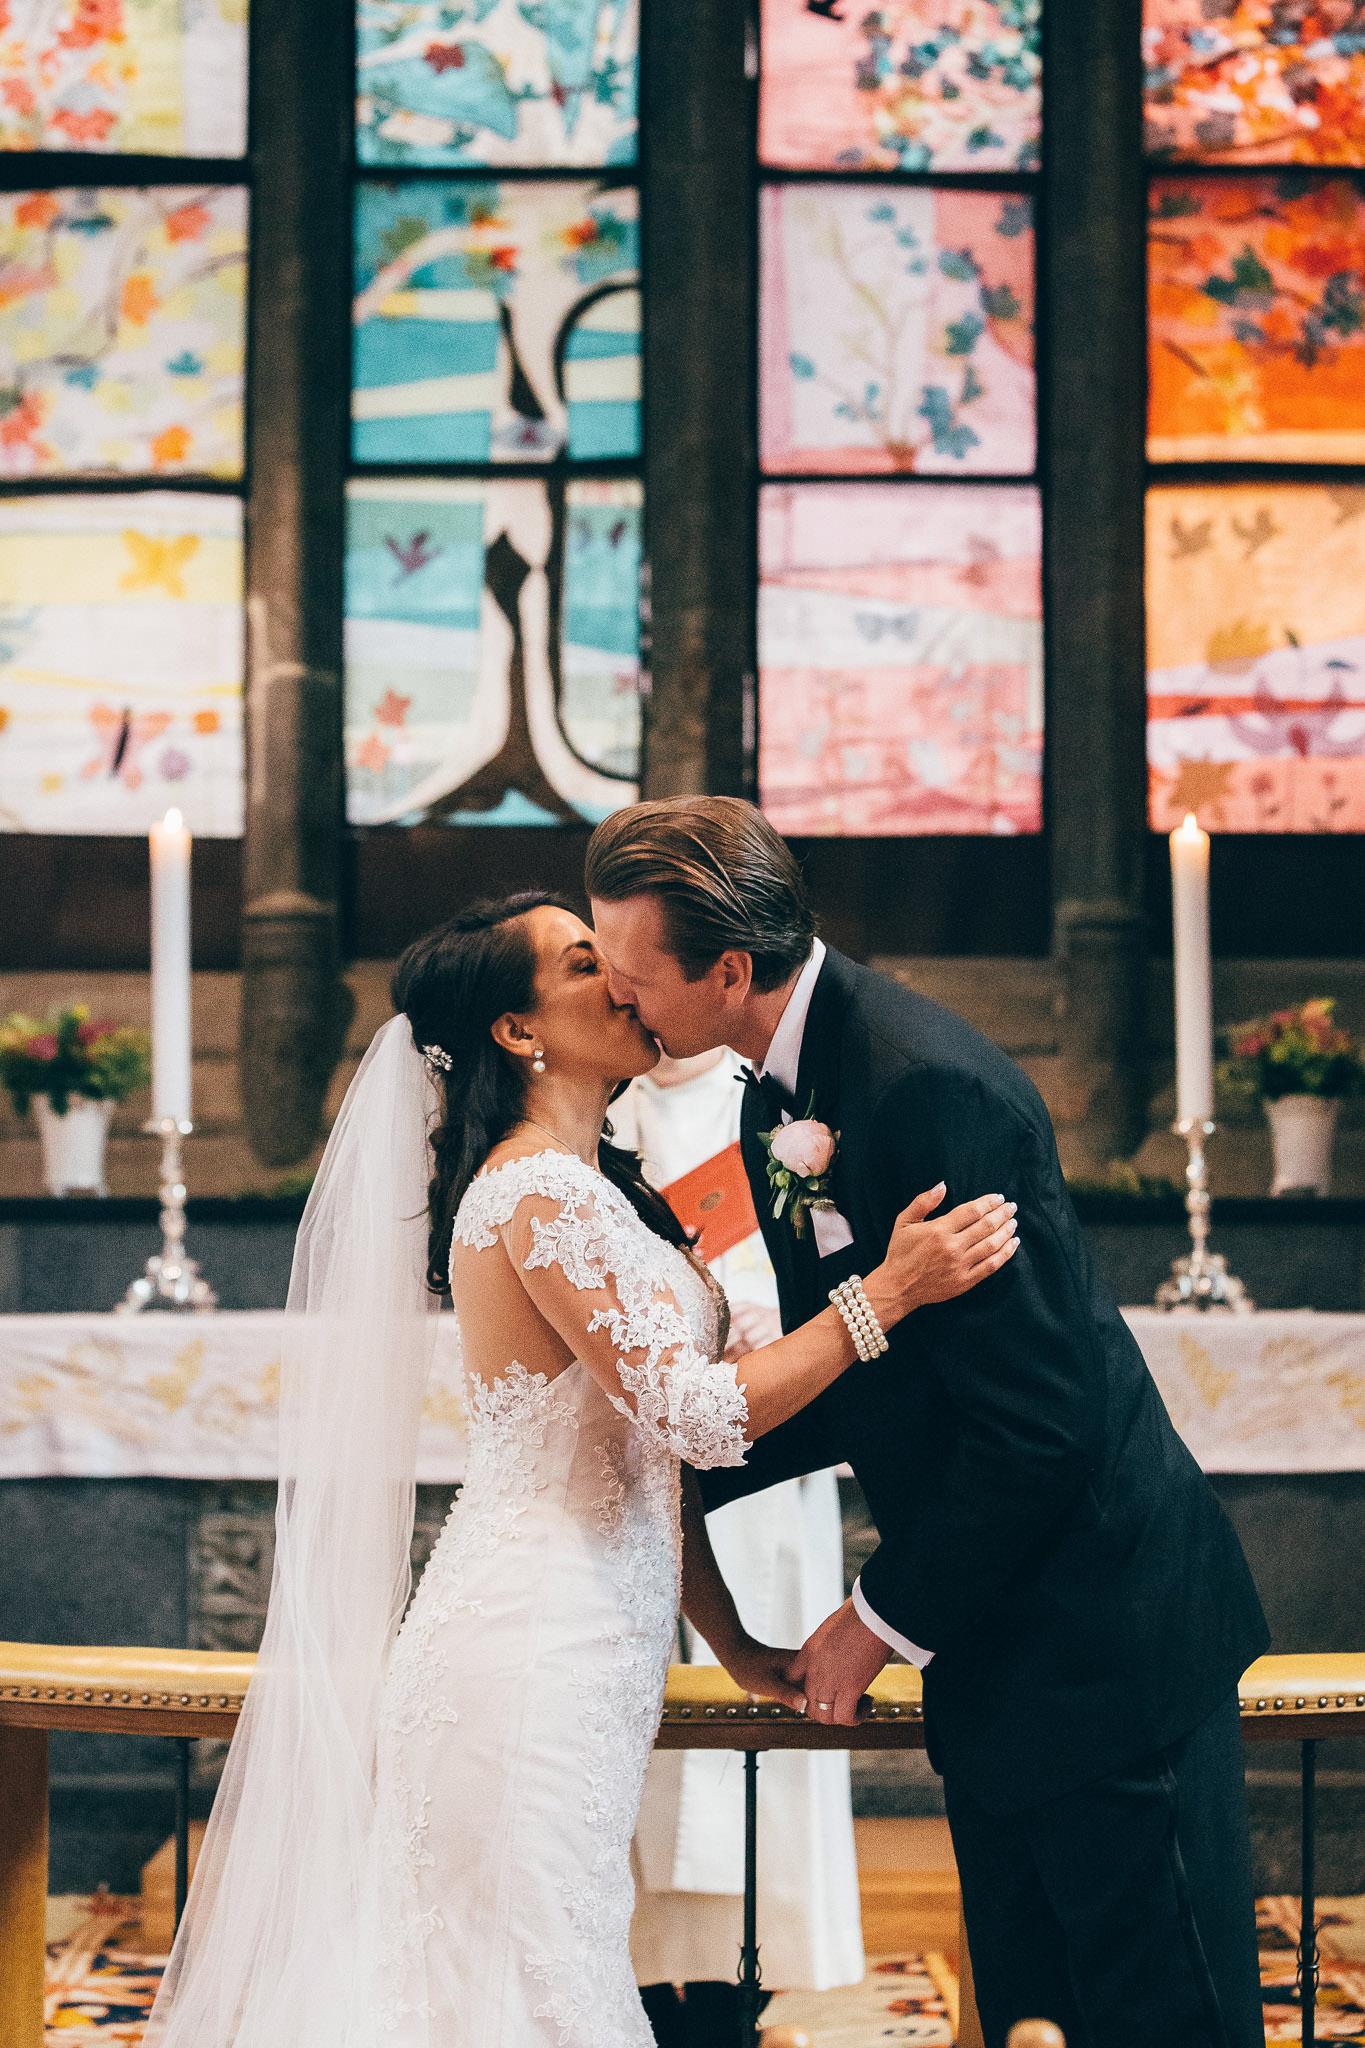 Wedding+Photographer+Norway+Bryllupsfotograf+Casey+Arneson+MK-128.jpg